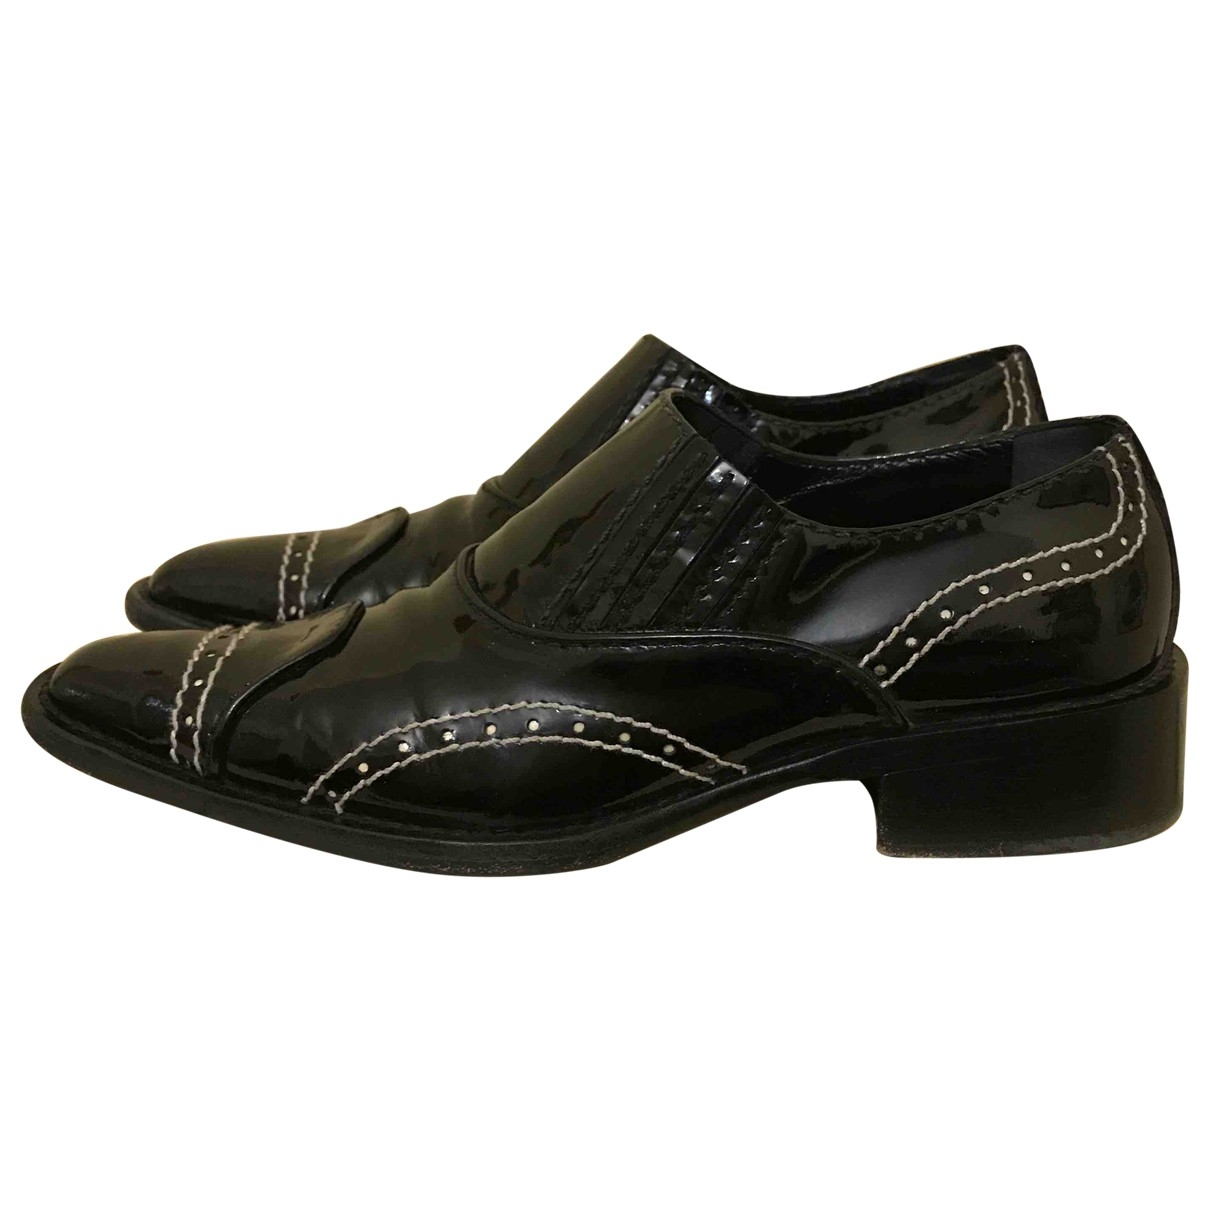 Giorgio Armani - Derbies   pour femme en cuir verni - noir